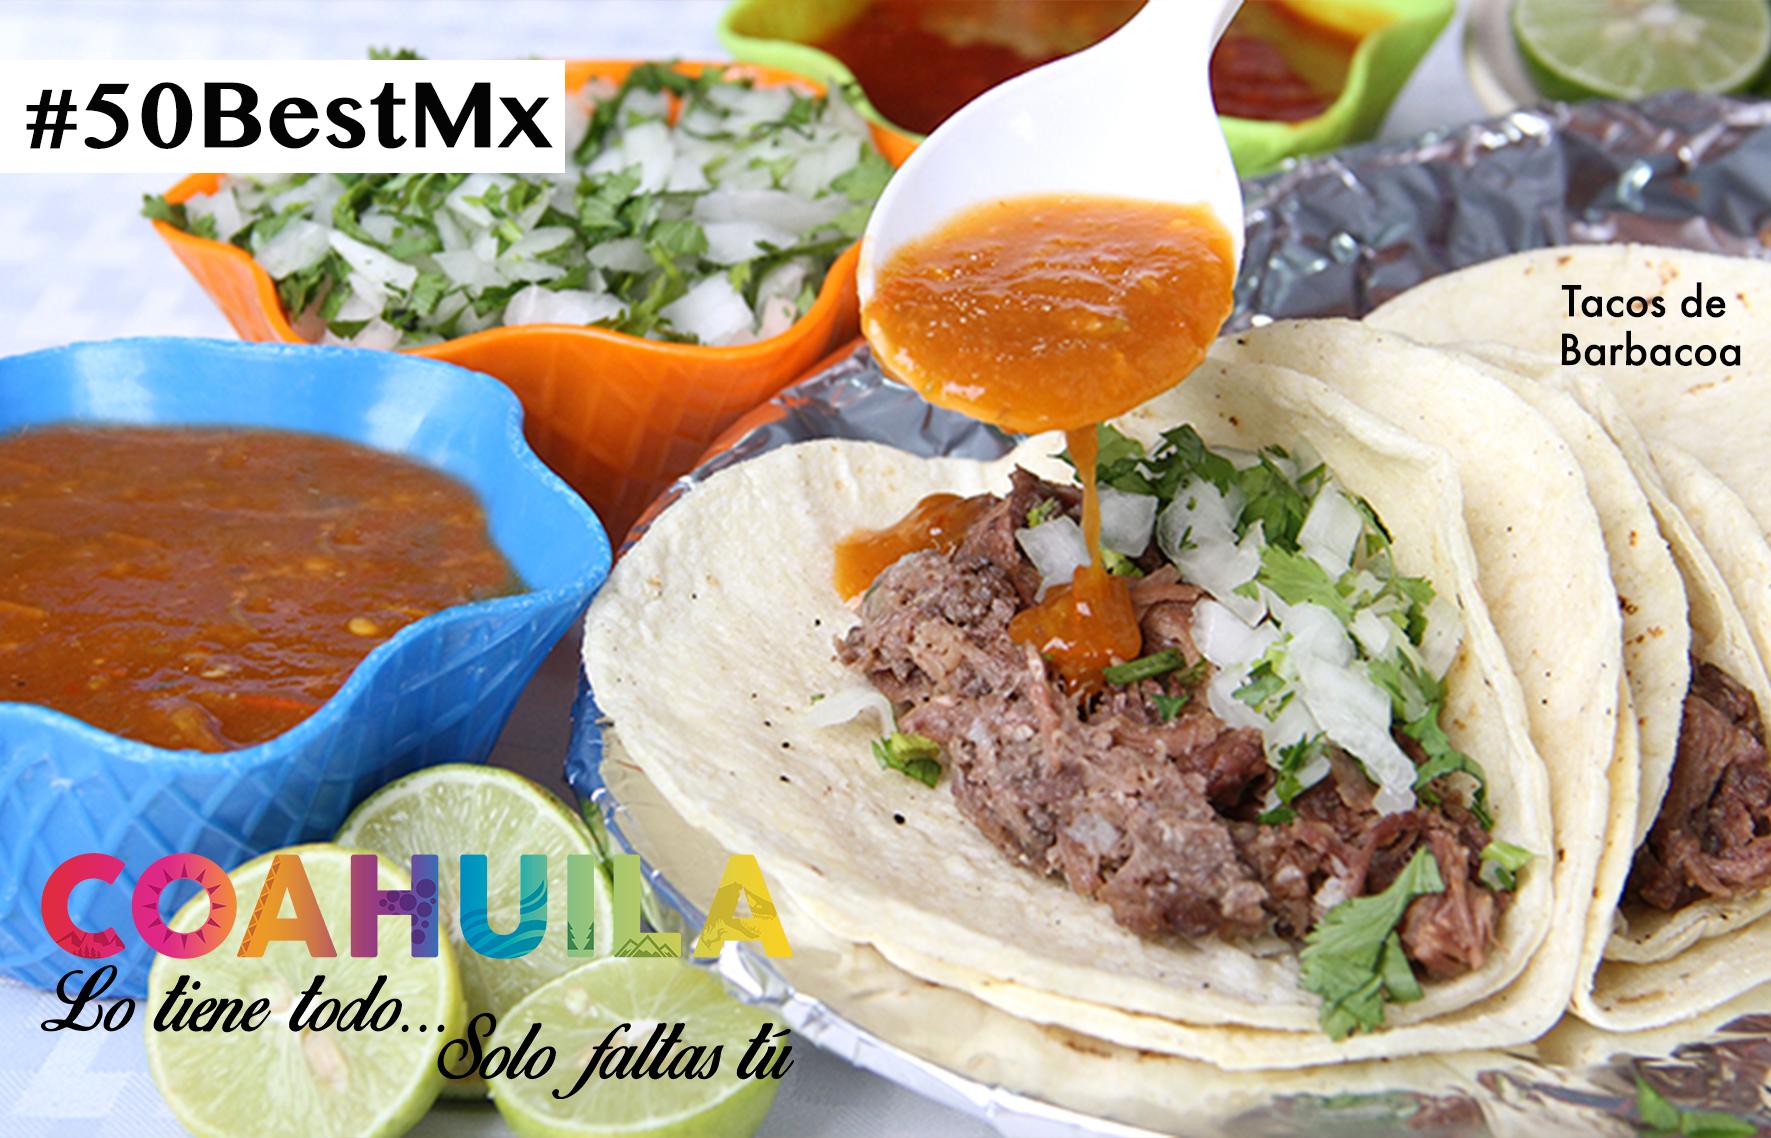 tacos barbacoa coahuilapng